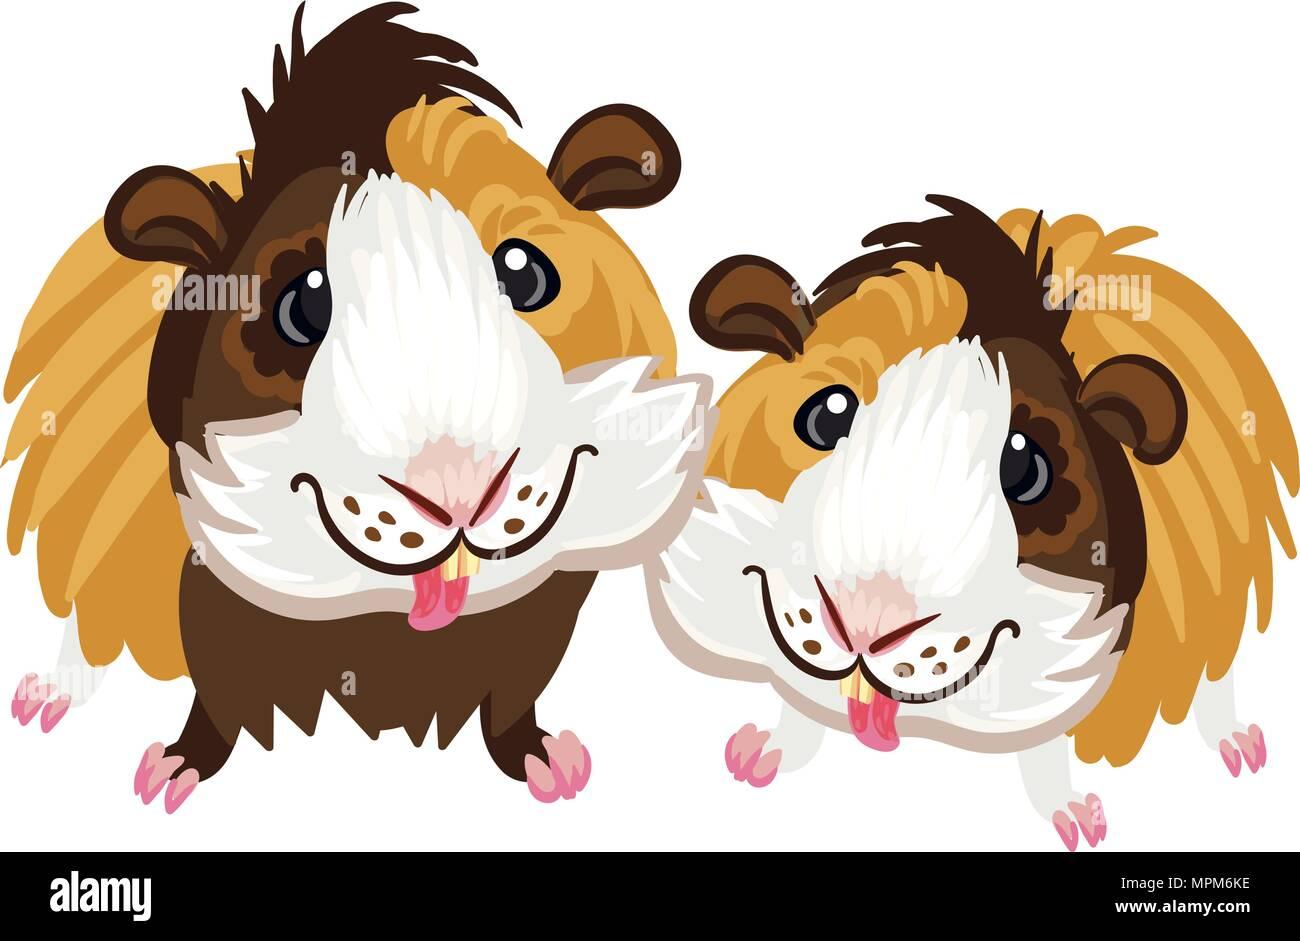 Petit Cochon Mignon Cartoon Maison Fun Art Clipart Cochon Image Vectorielle Stock Alamy